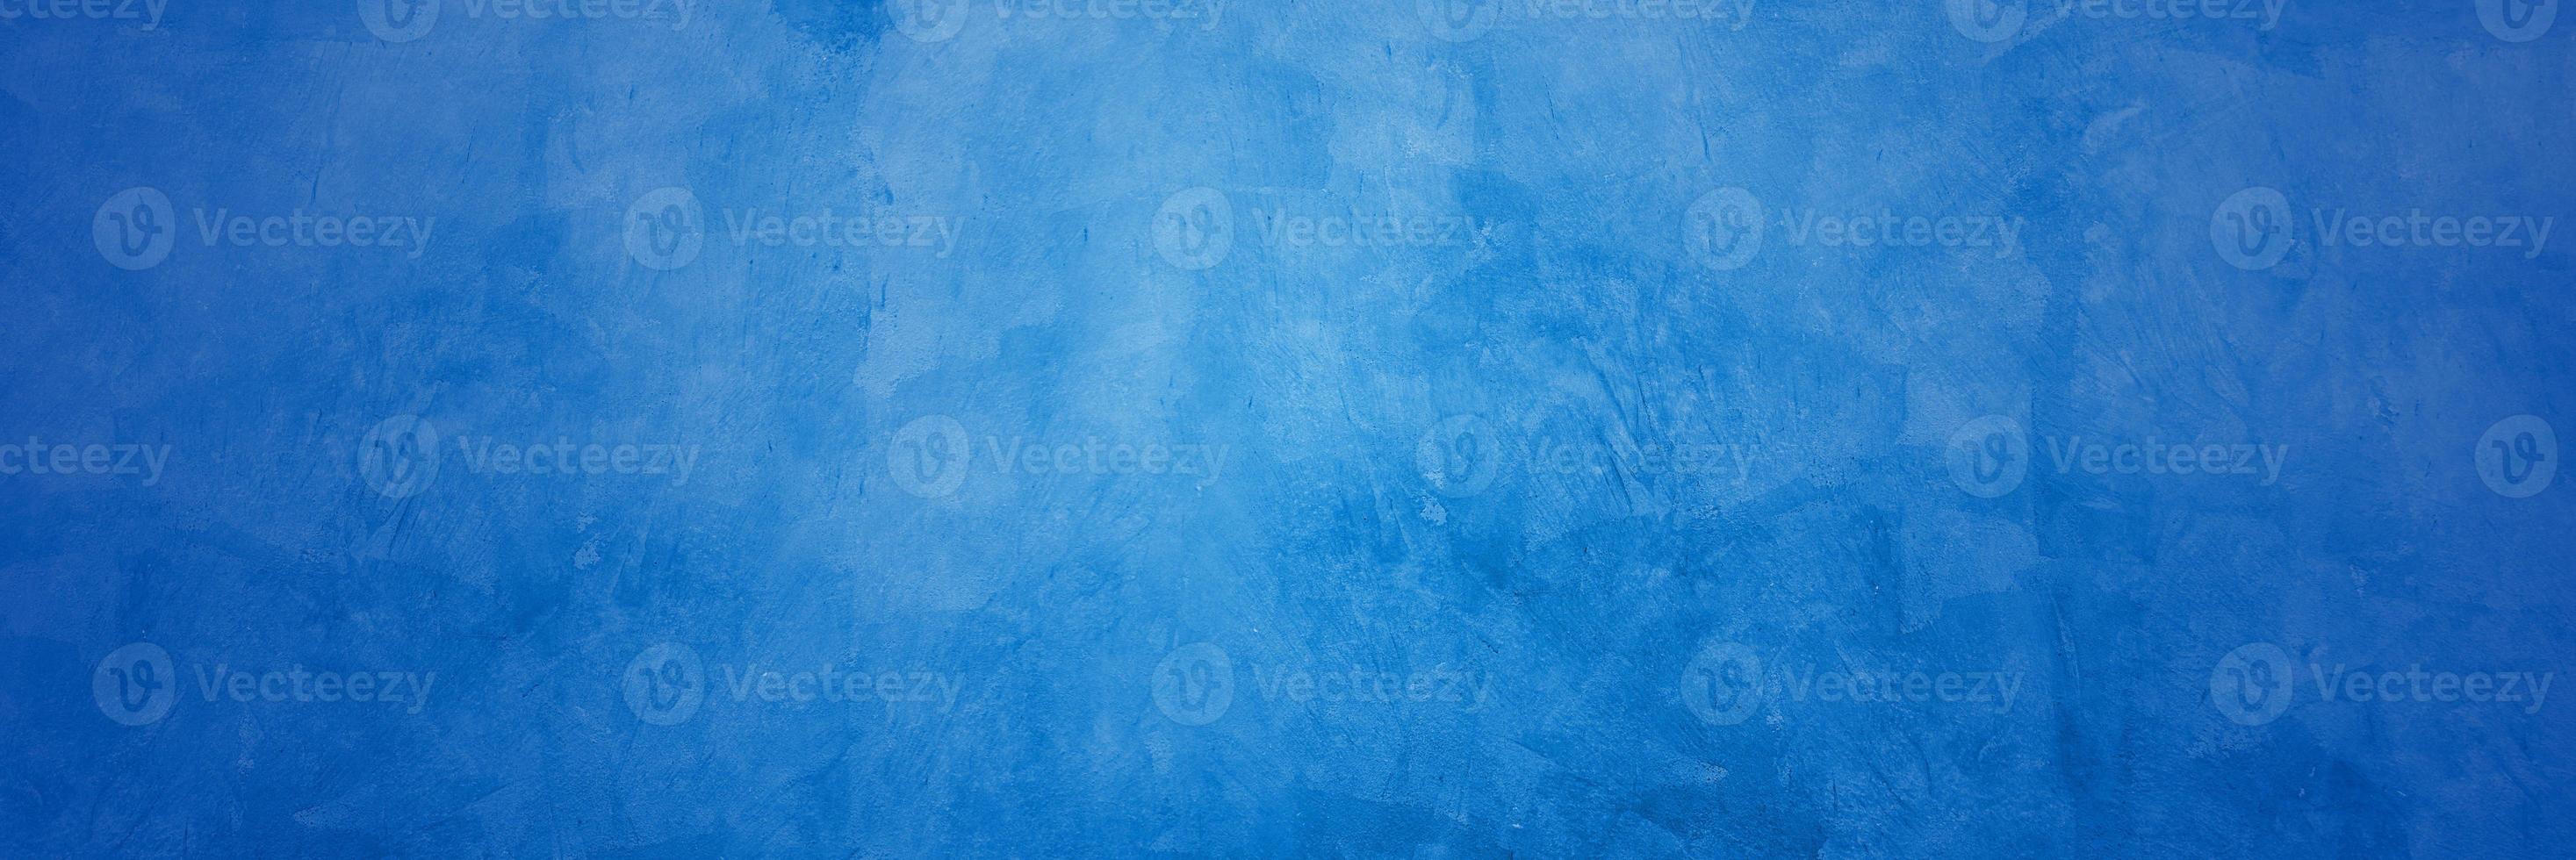 parede de cimento azul para textura ou fundo foto